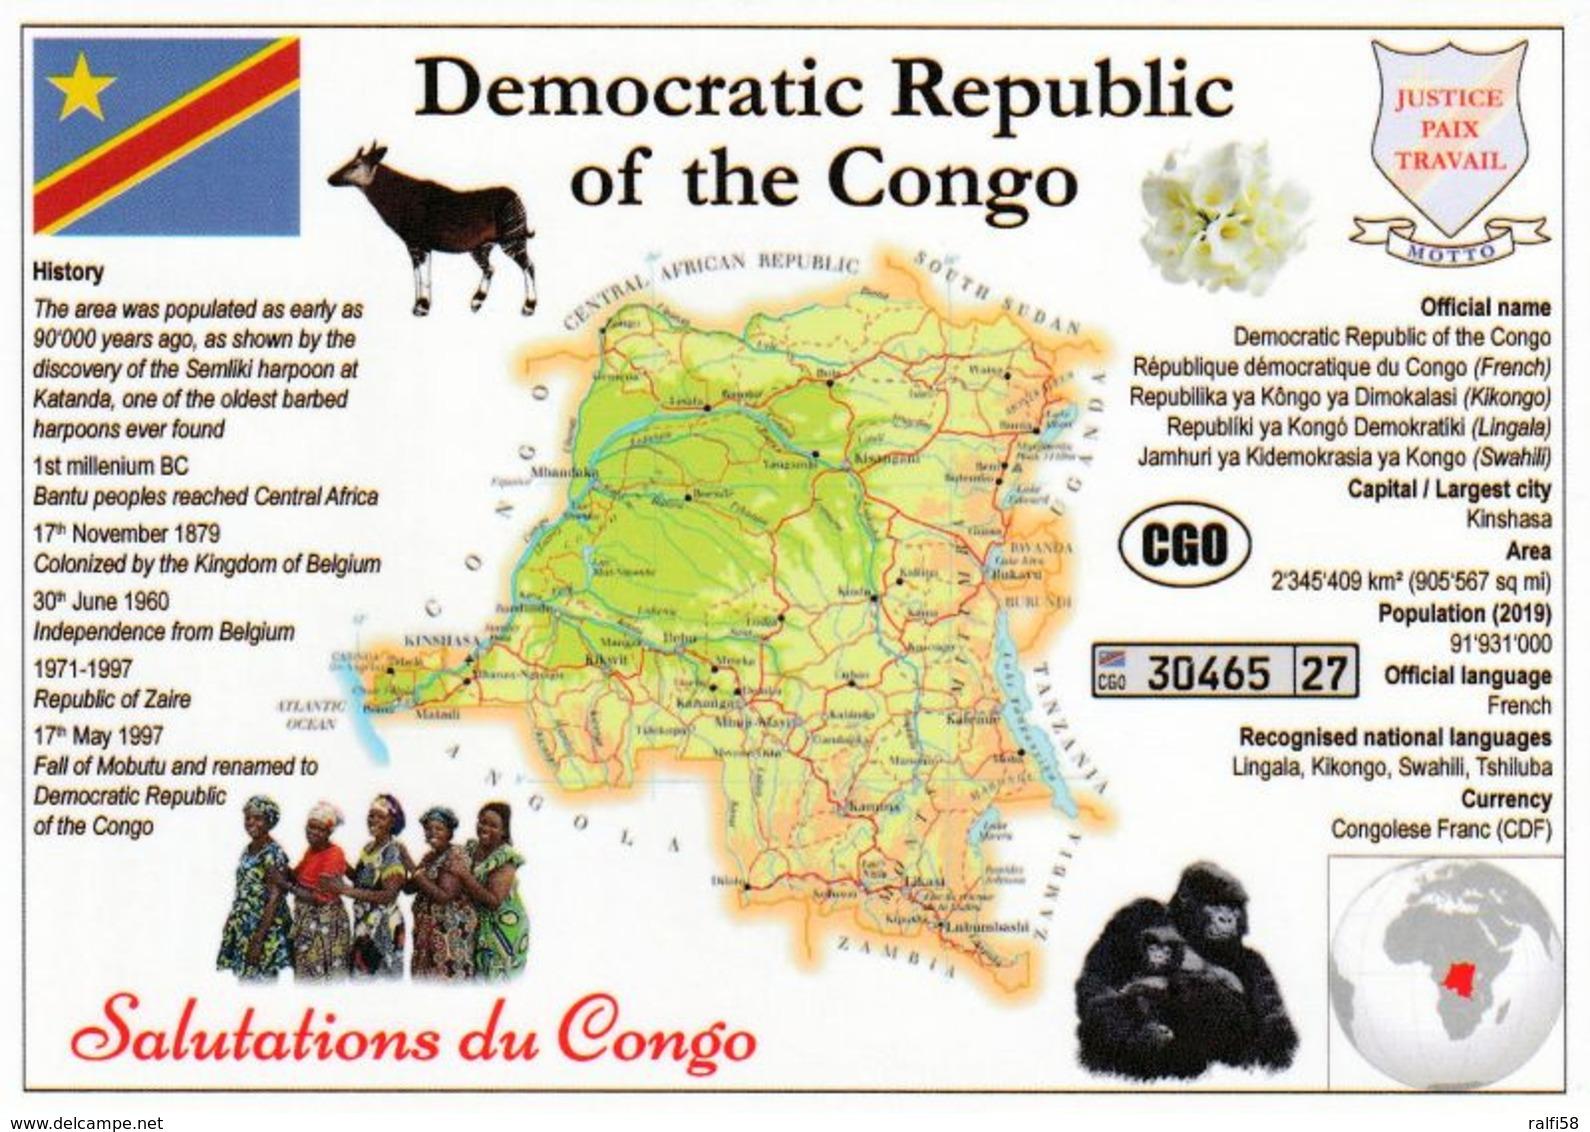 1 Map Of Democratic Republic Of Congo * Landkarte Demokratische Republik Kongo, Flagge Und Weiteren Informationen * - Autres